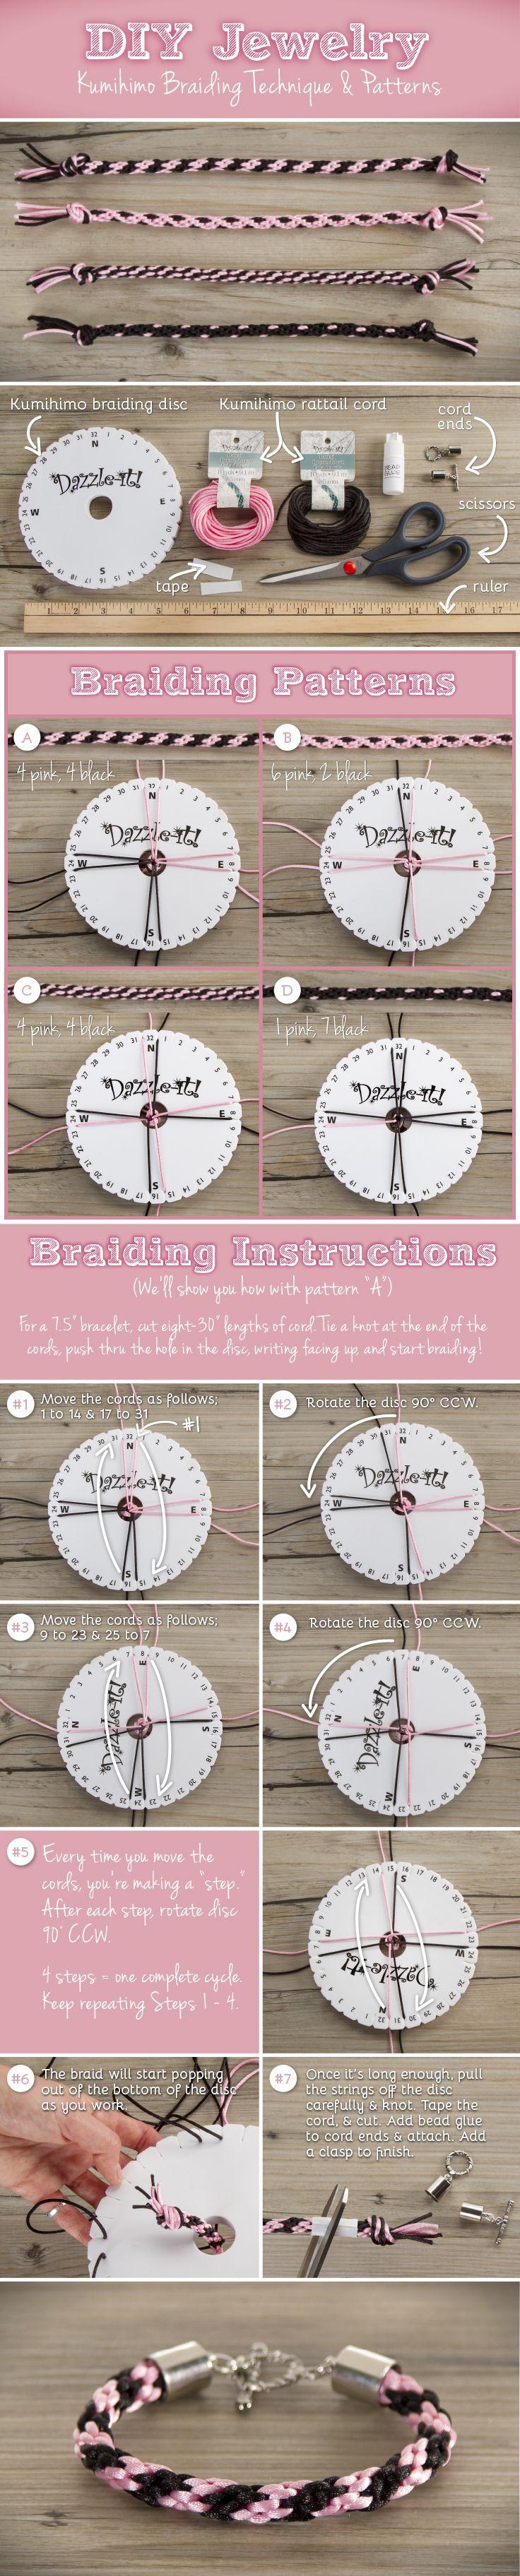 #DIY Kumihimo Braiding Techniques for Jewelry Bracelet #cbloggers #giftidea